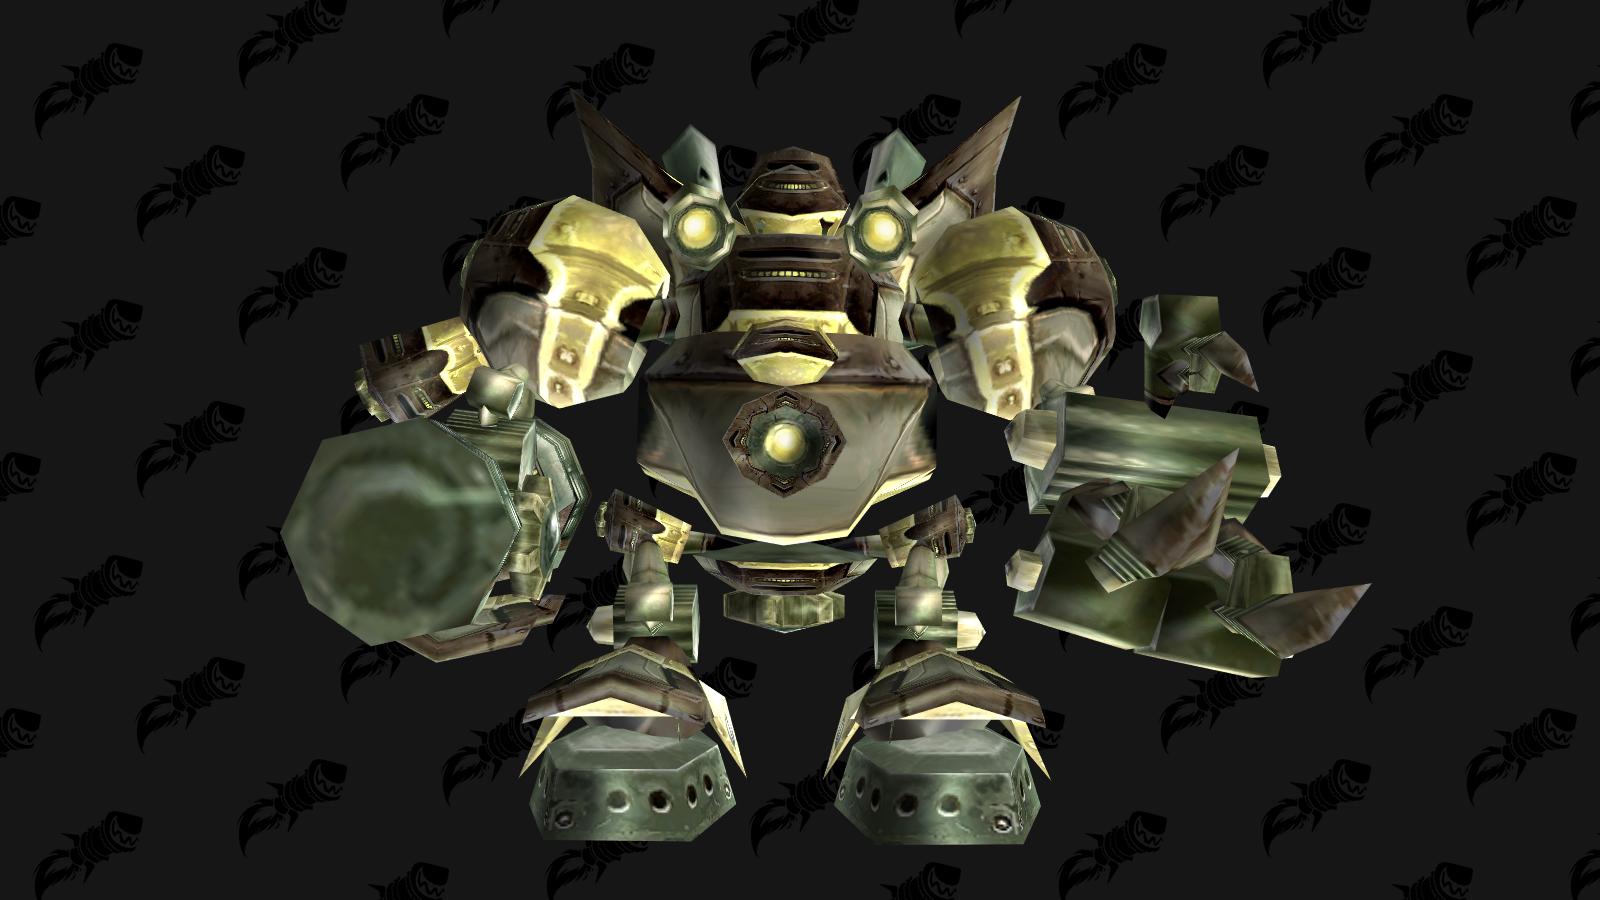 Dernier boss du donjons de mascottes de Gnomeregan : Robot Pulverizer Mk 6001